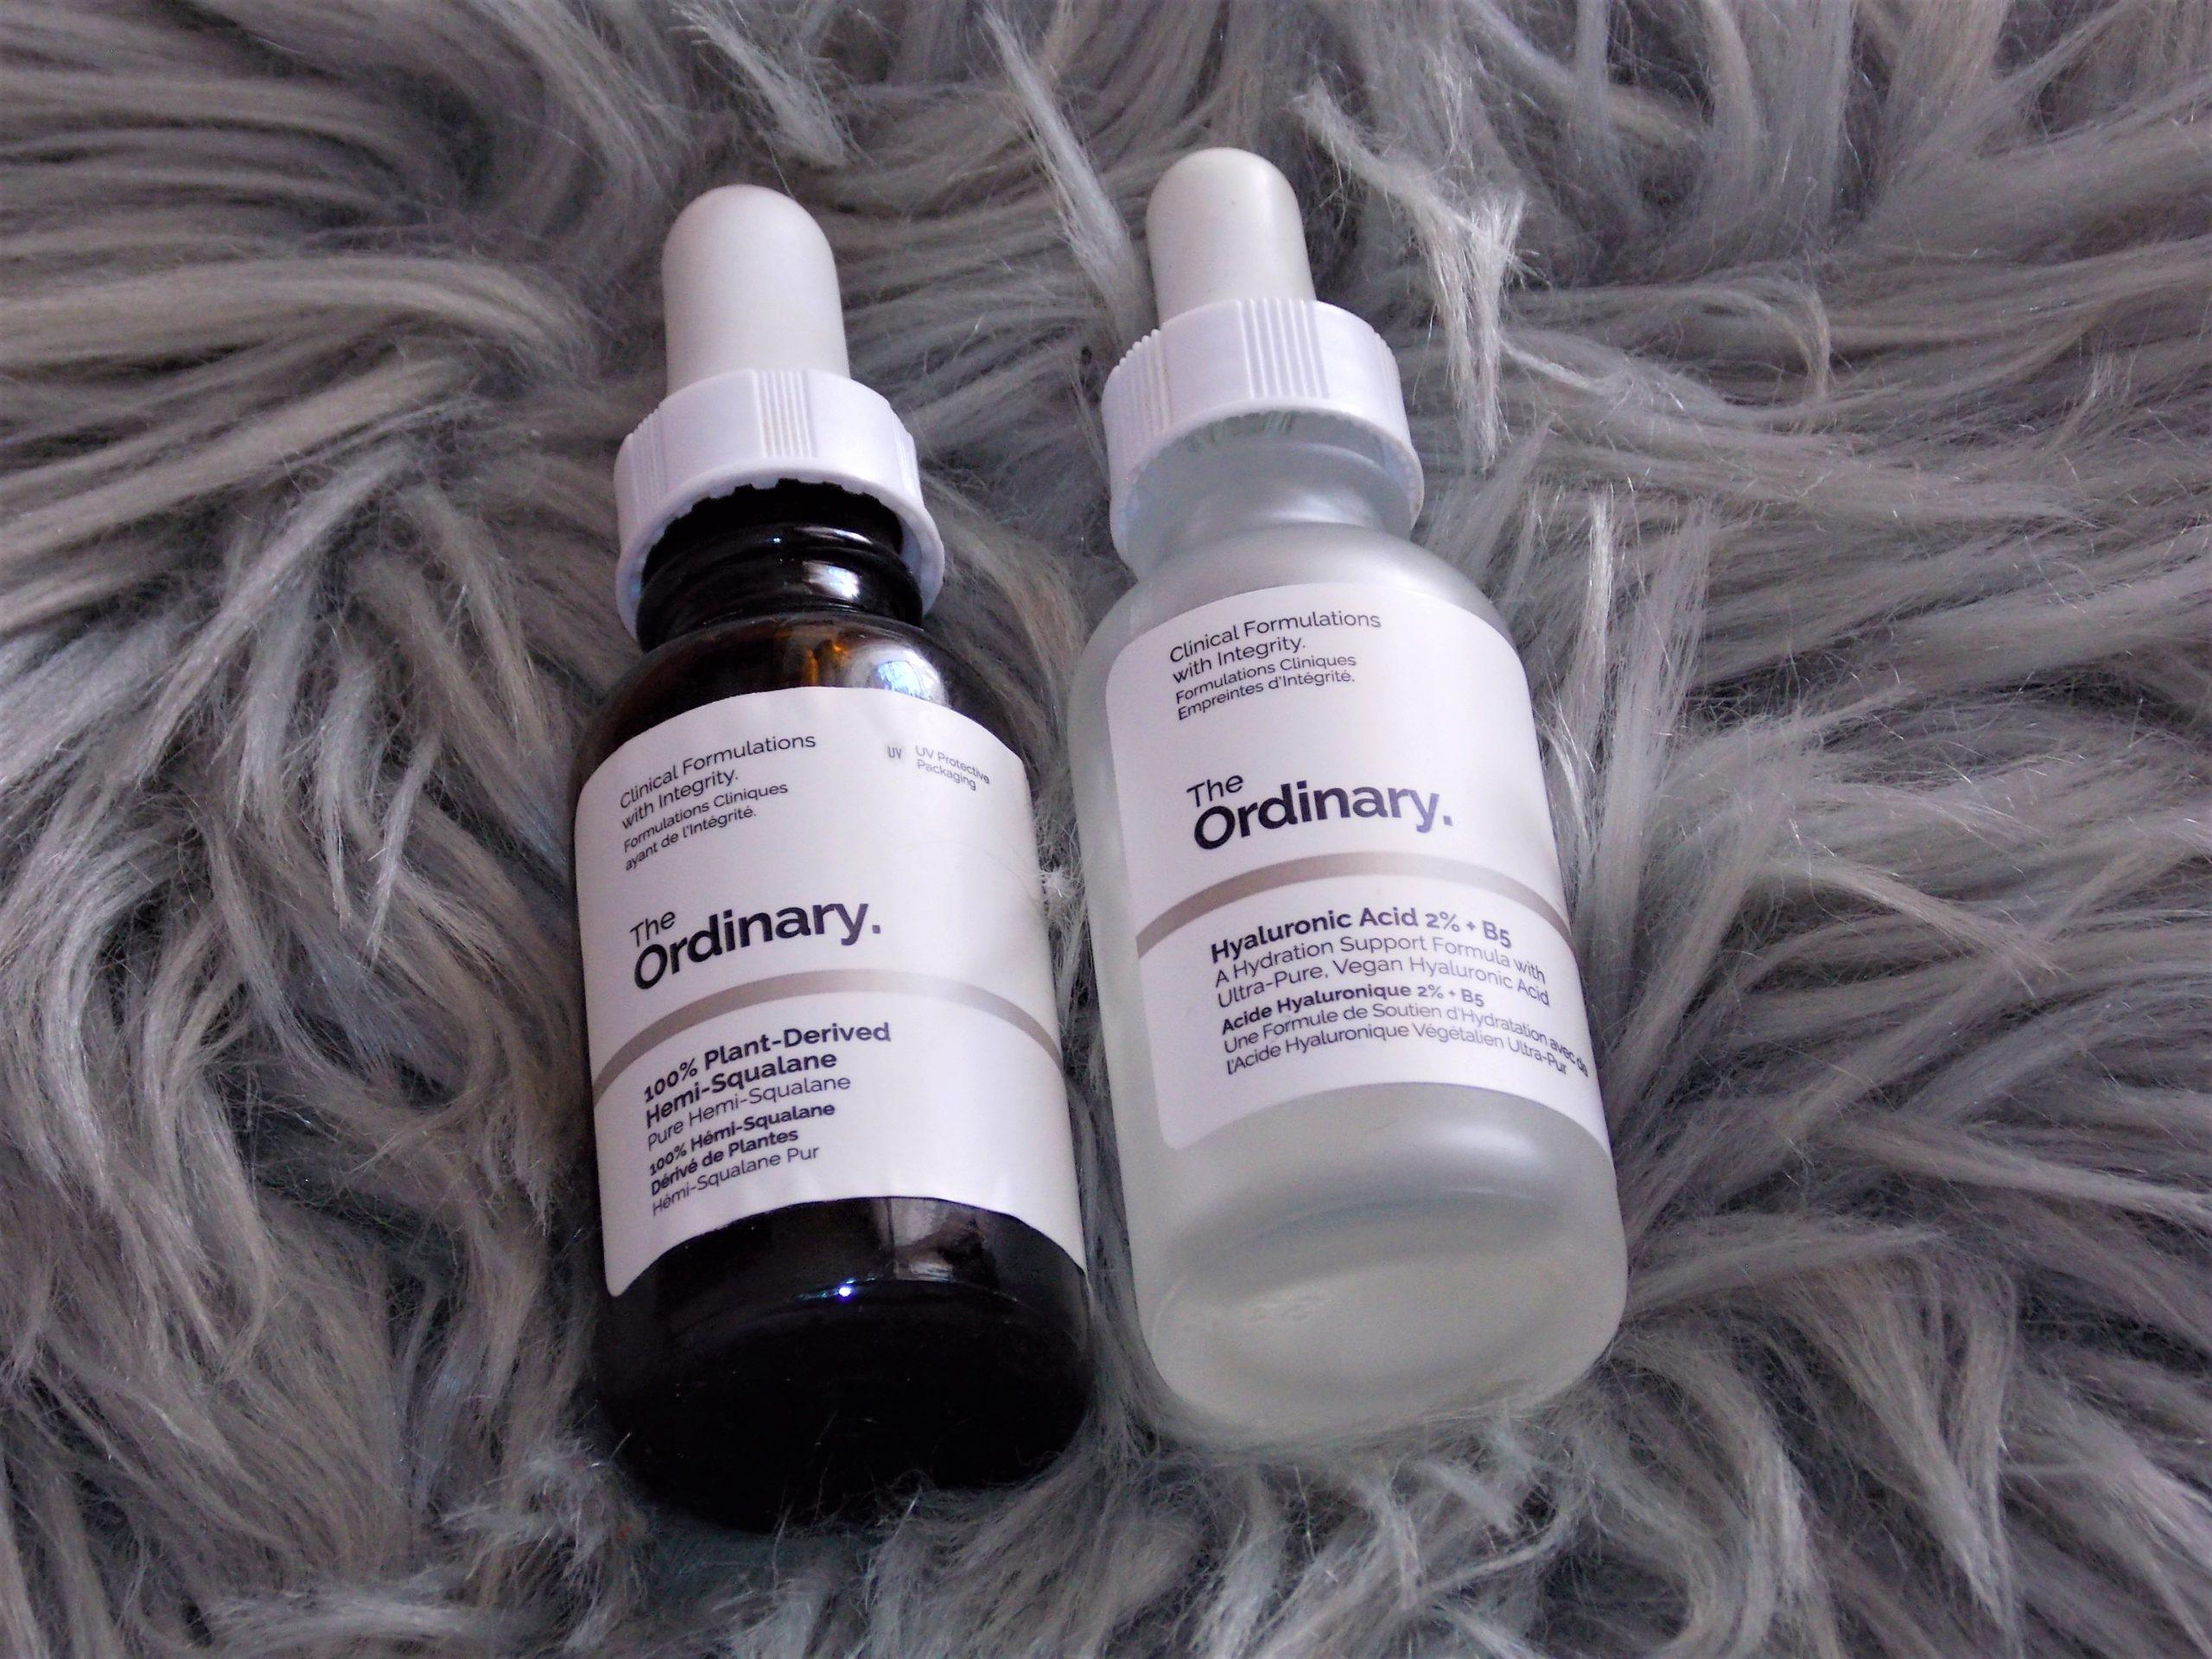 the ordinary products lookfantastic haul look fantastic livinglikev fashion blogger beauty blogger